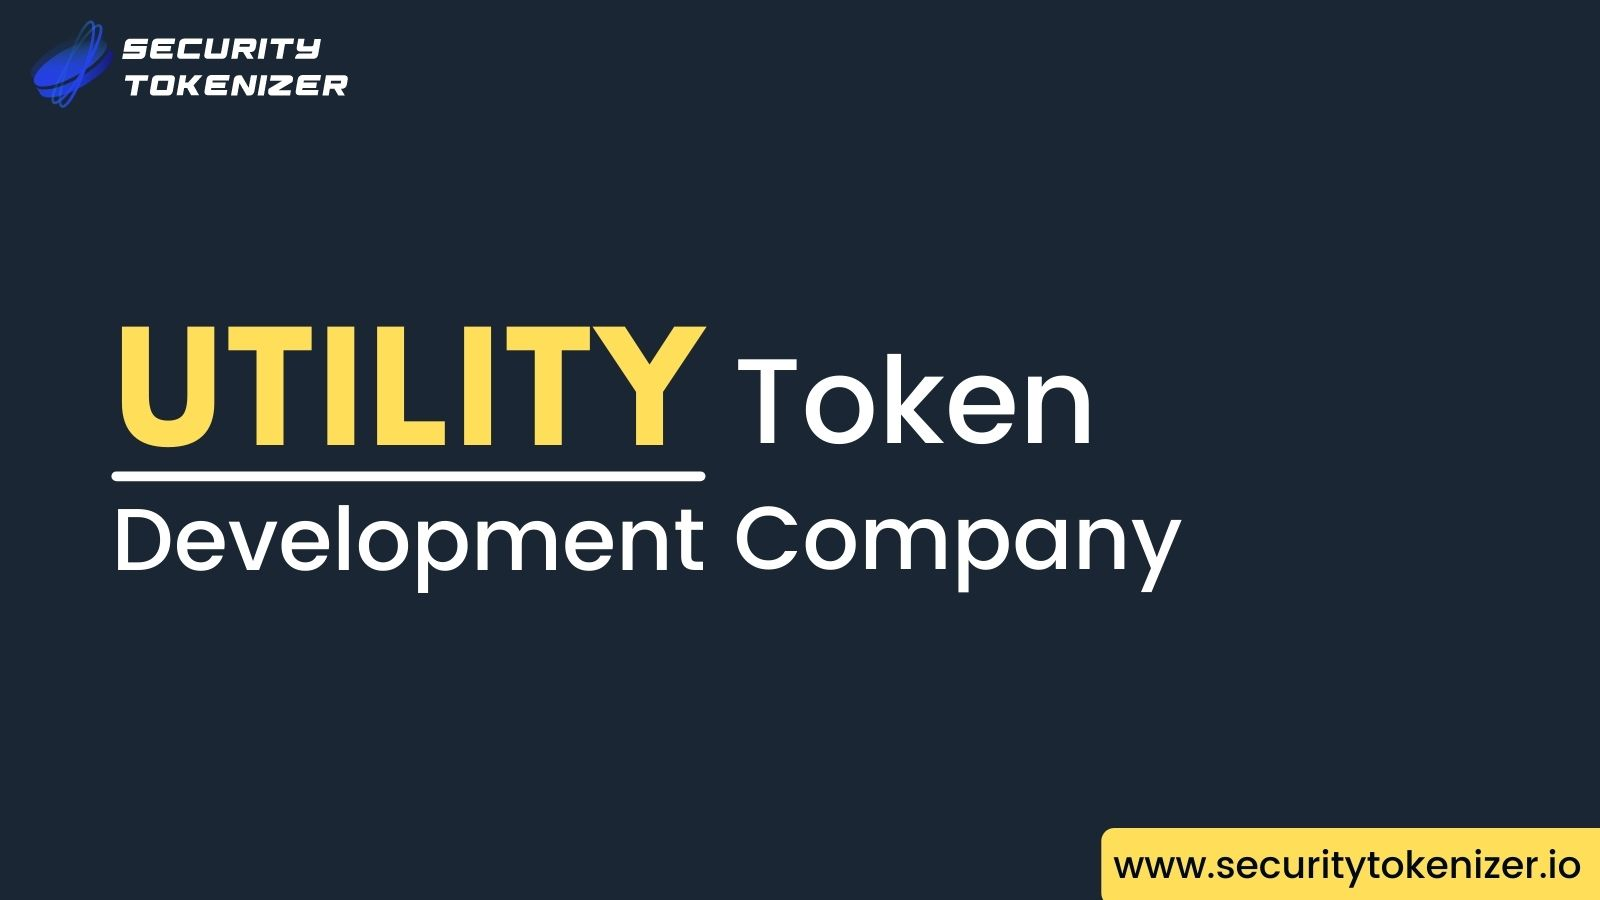 Utility Token Development Company